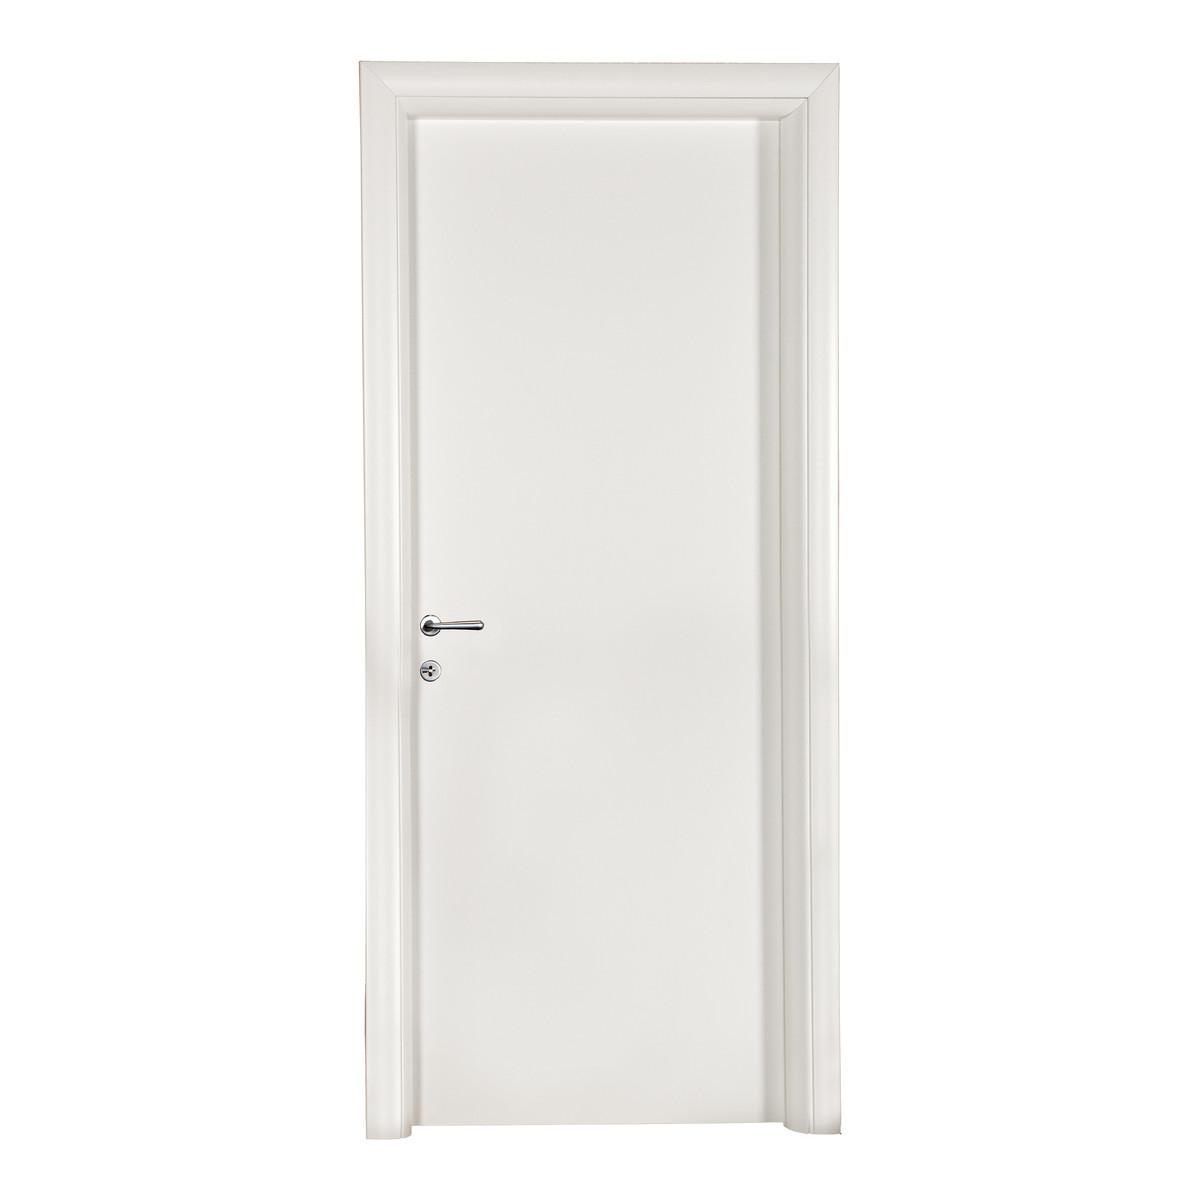 Porta da interno battente pearl bianco 80 x h 210 cm - Porta carta igienica leroy merlin ...